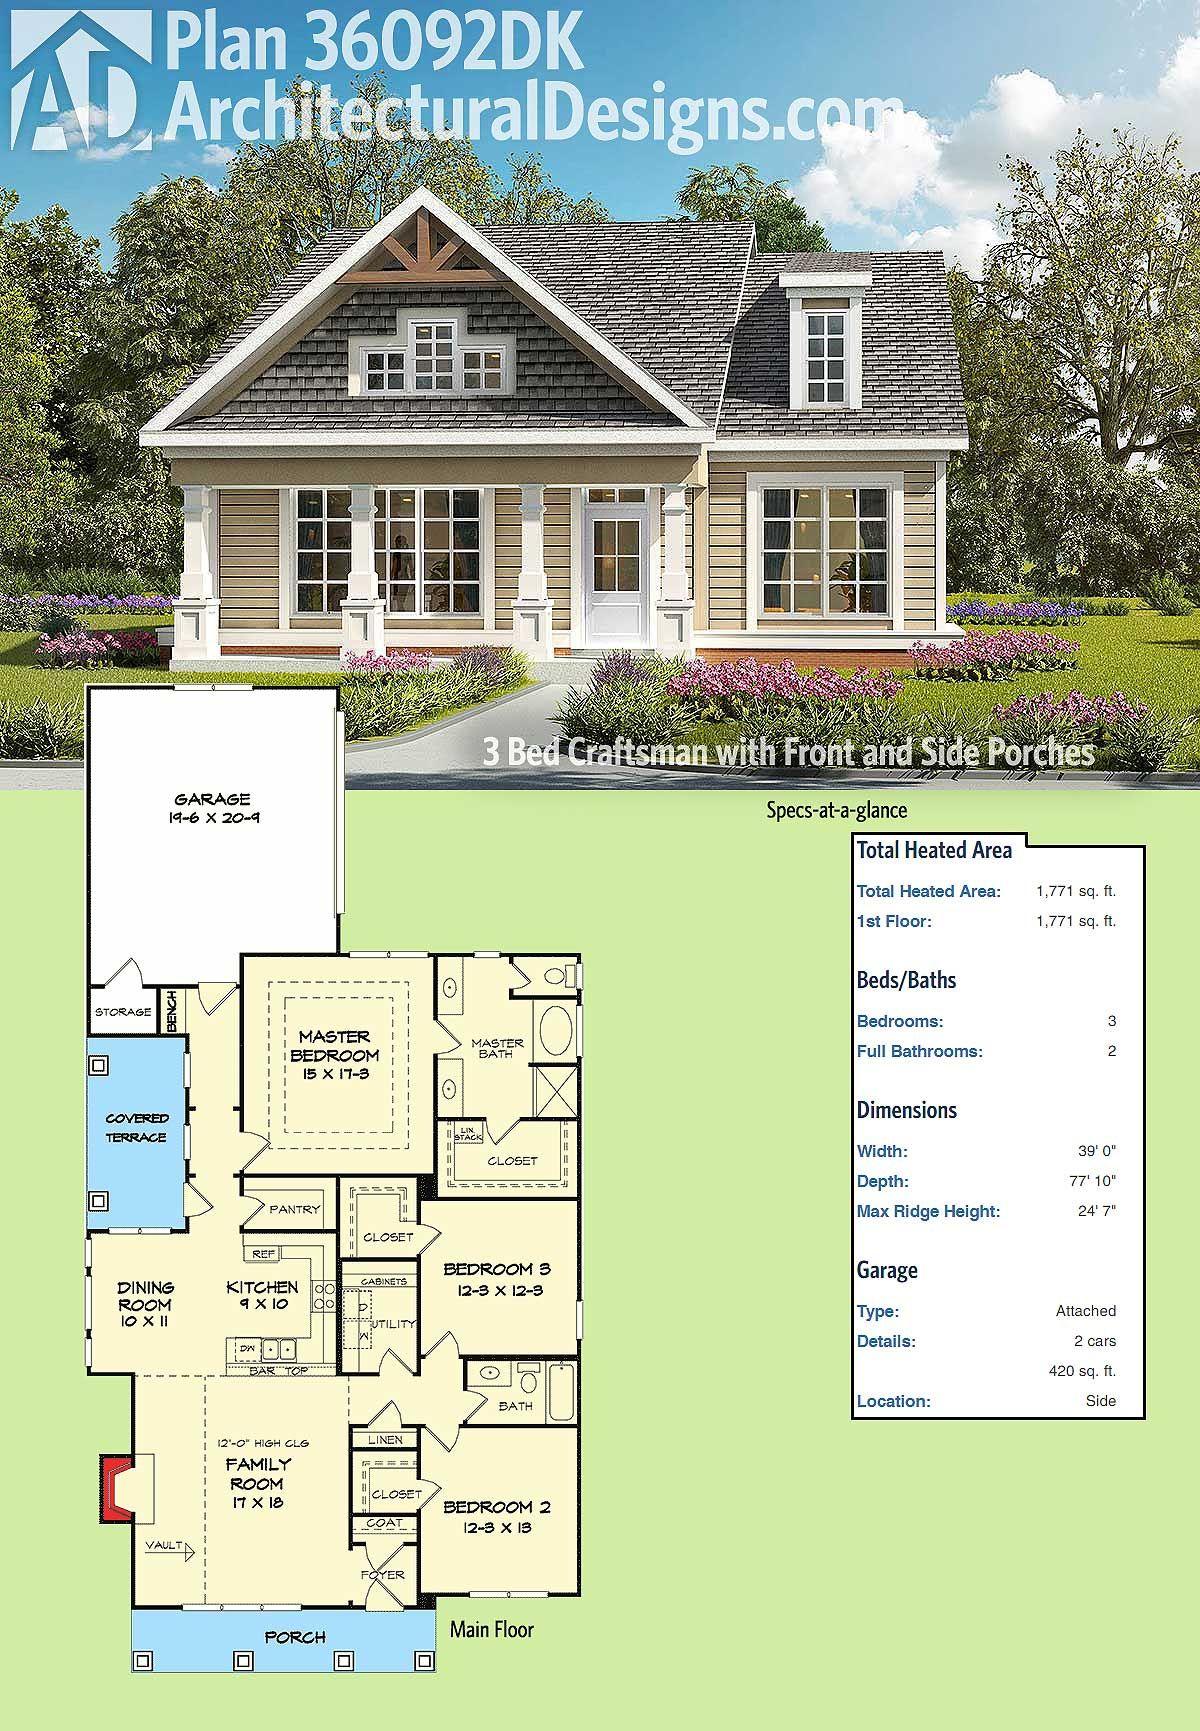 Architectural Designs 3 Bed Craftsman House Plan